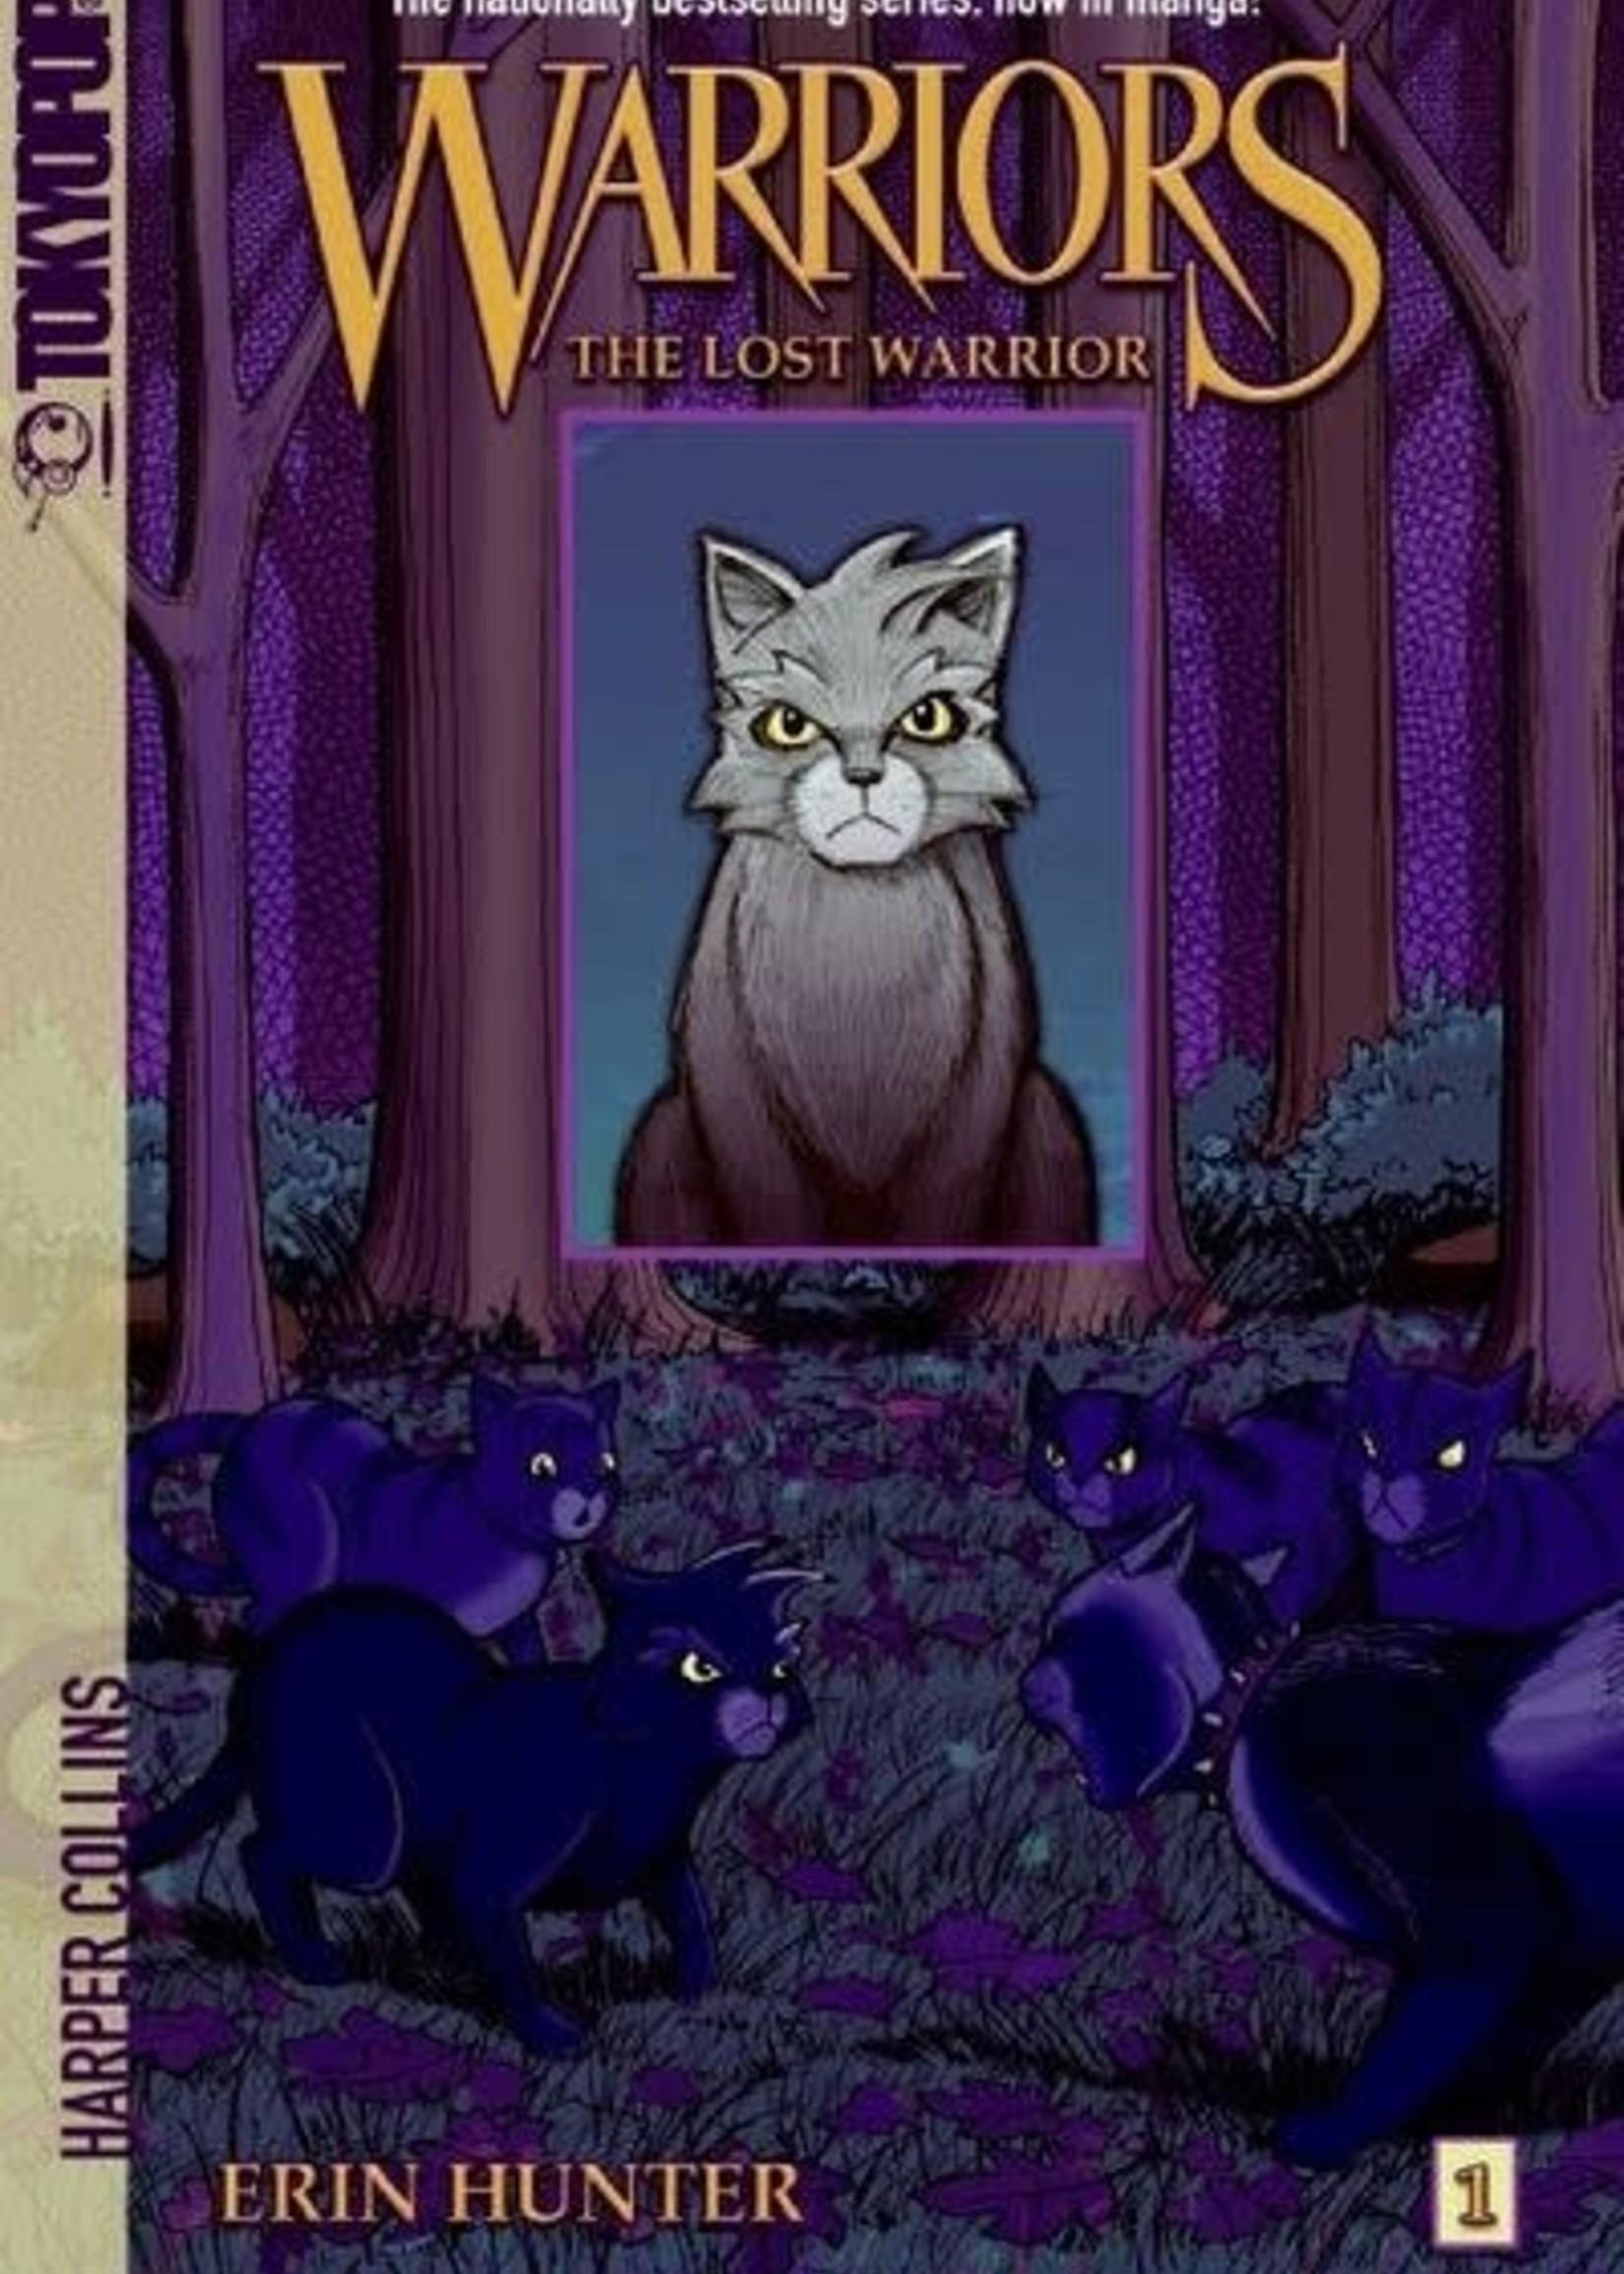 Warriors TokyoPop #01, The Lost Warrior Graphic Novel - Paperback